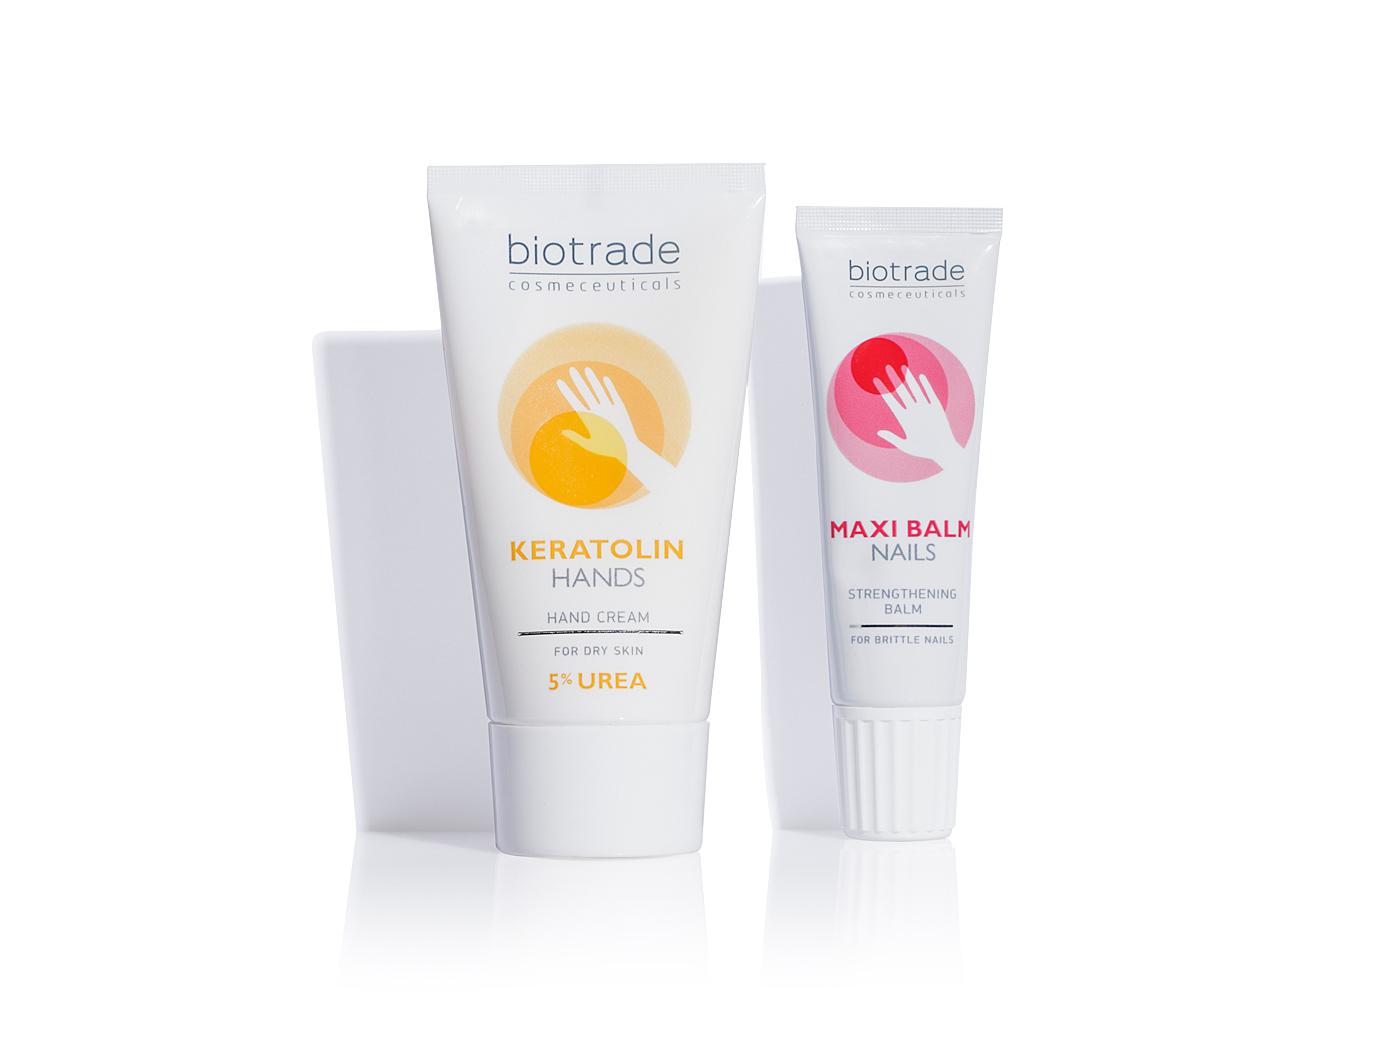 Biotrade brand product